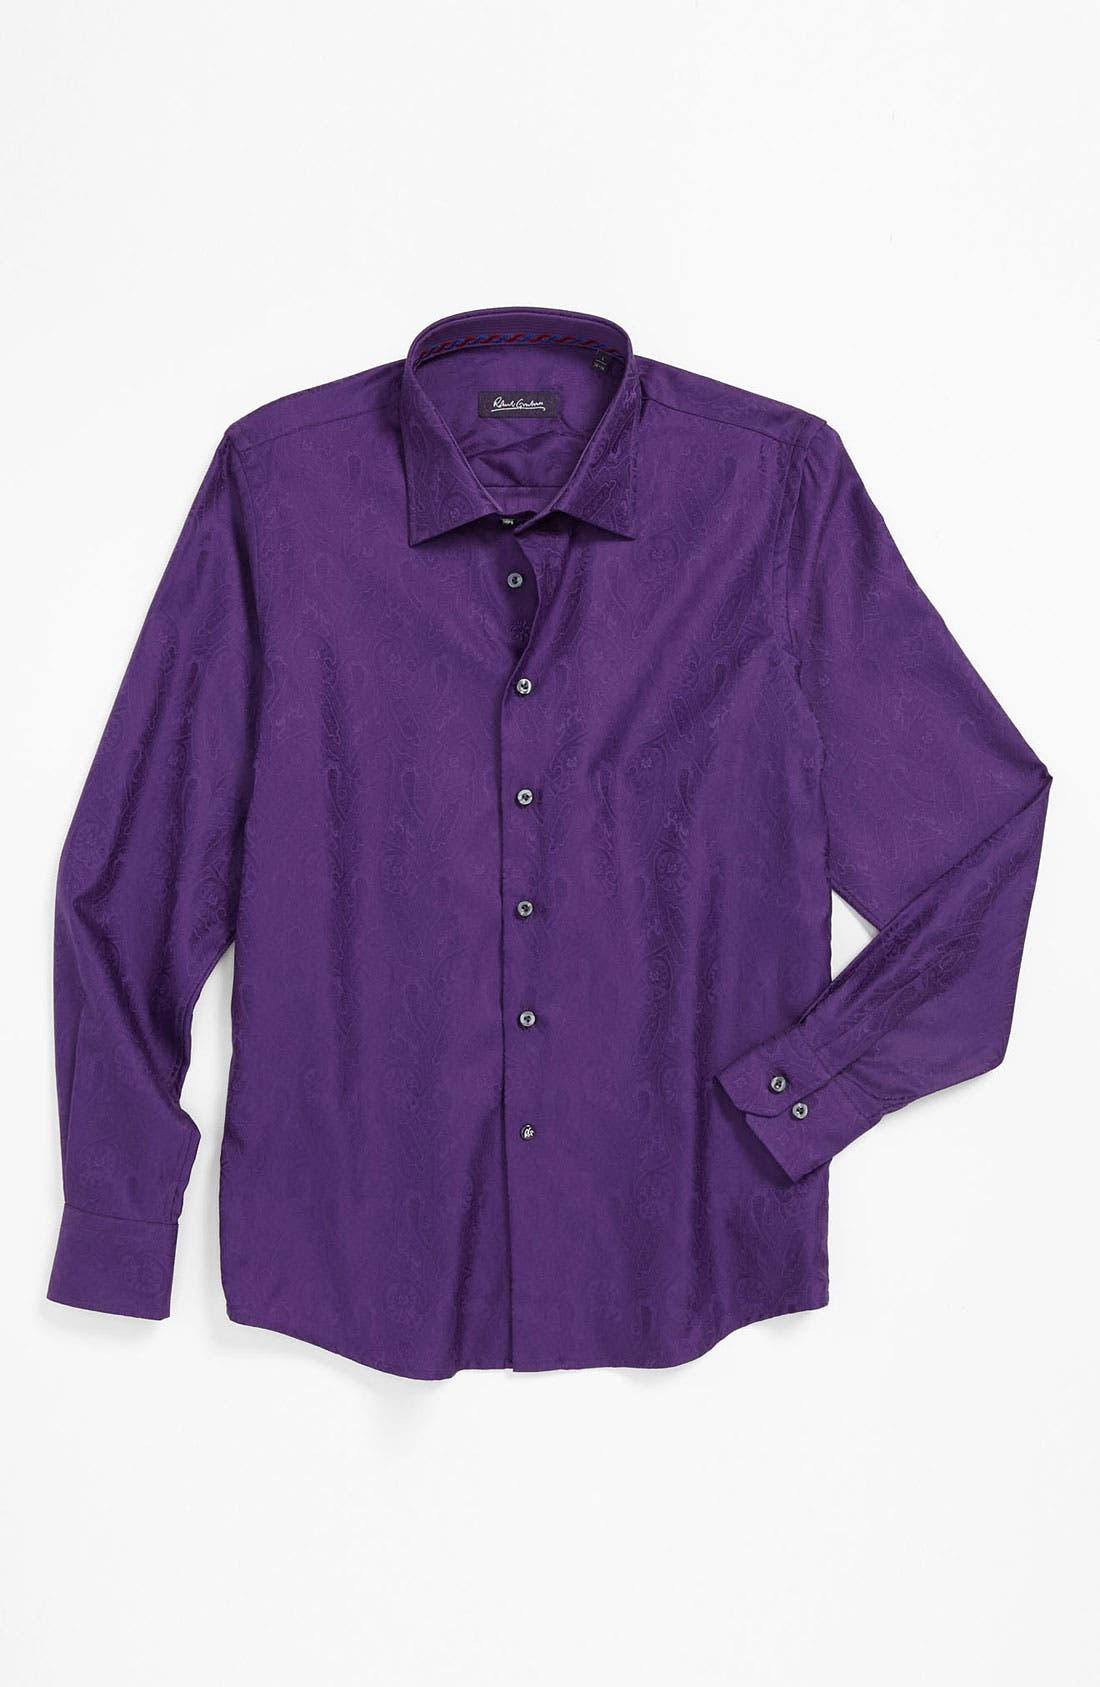 Alternate Image 1 Selected - Robert Graham 'Clayton' Dress Shirt (Big Boys)